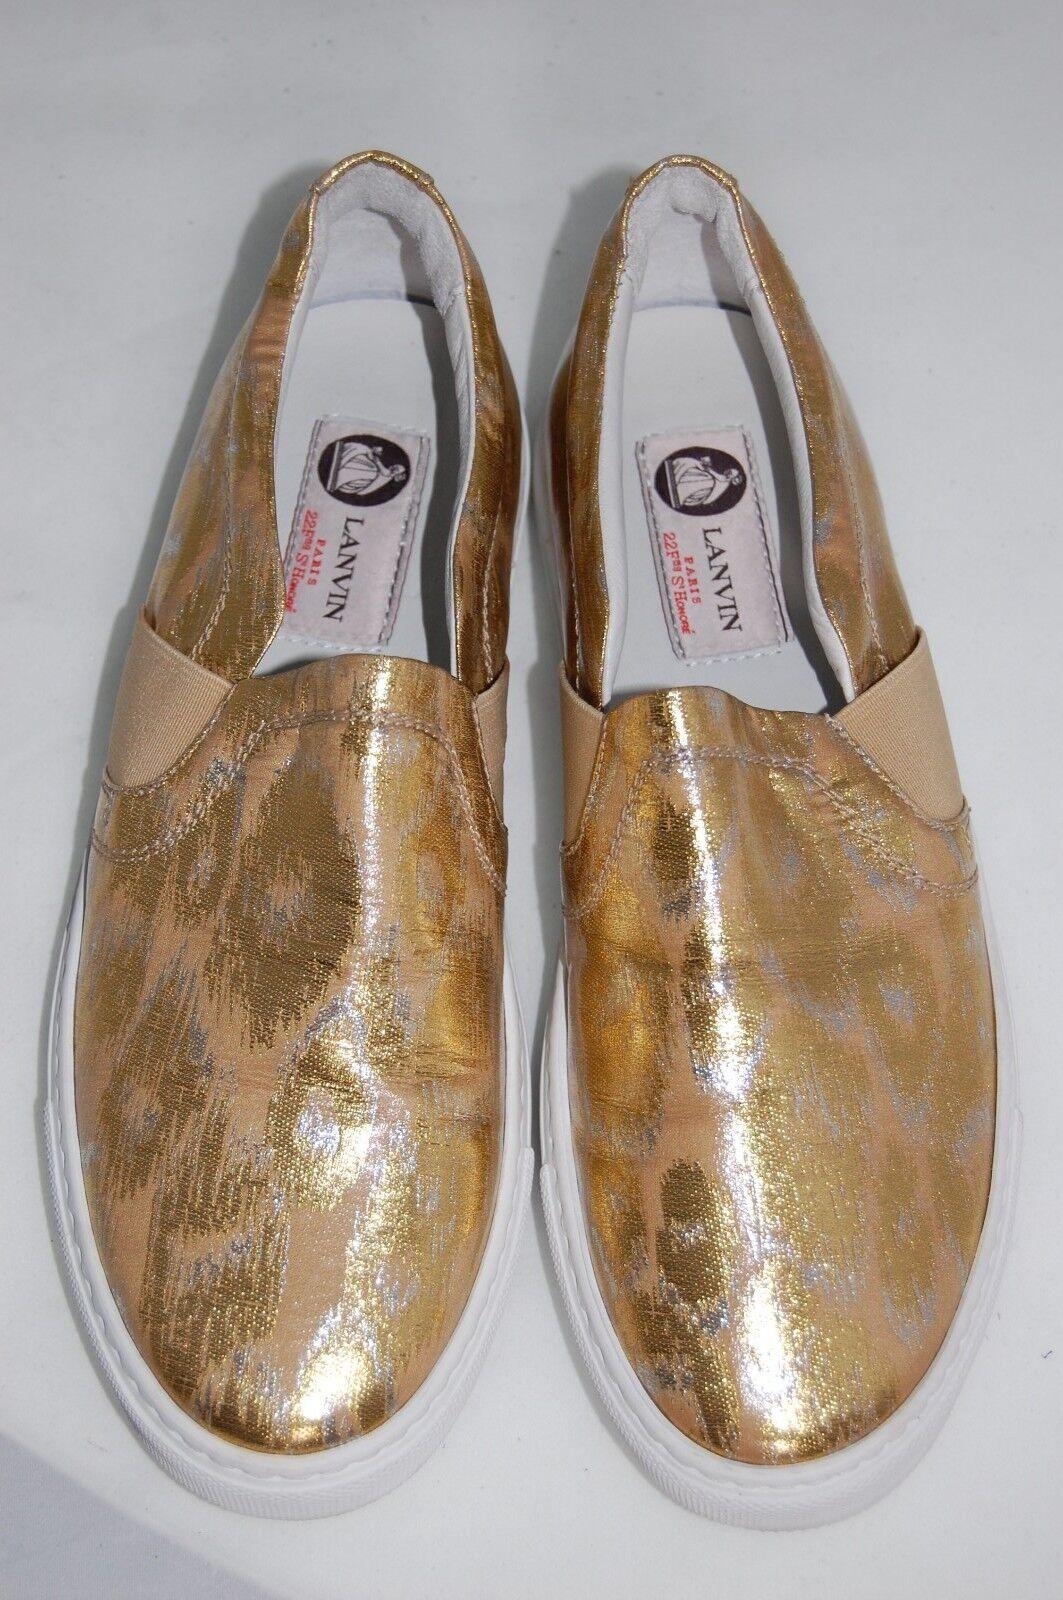 New $495 LANVIN Gold Leopard Basket Slip-On Brocade Sneaker Flat Shoes 7 US/ 37